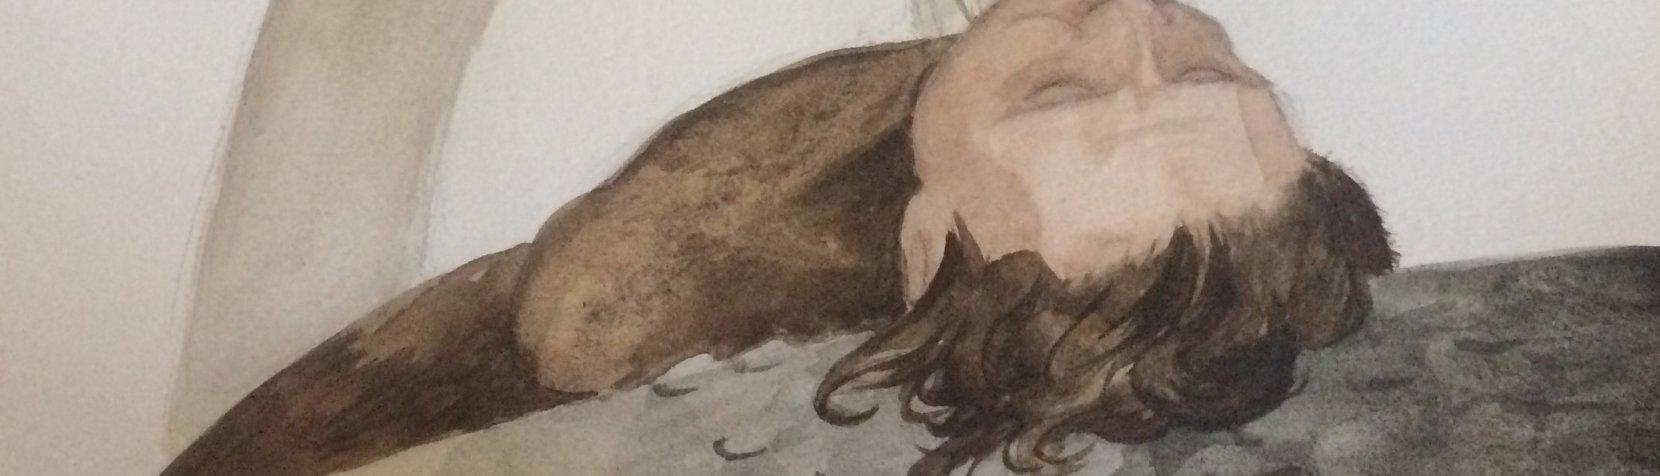 Tegning: Død mand